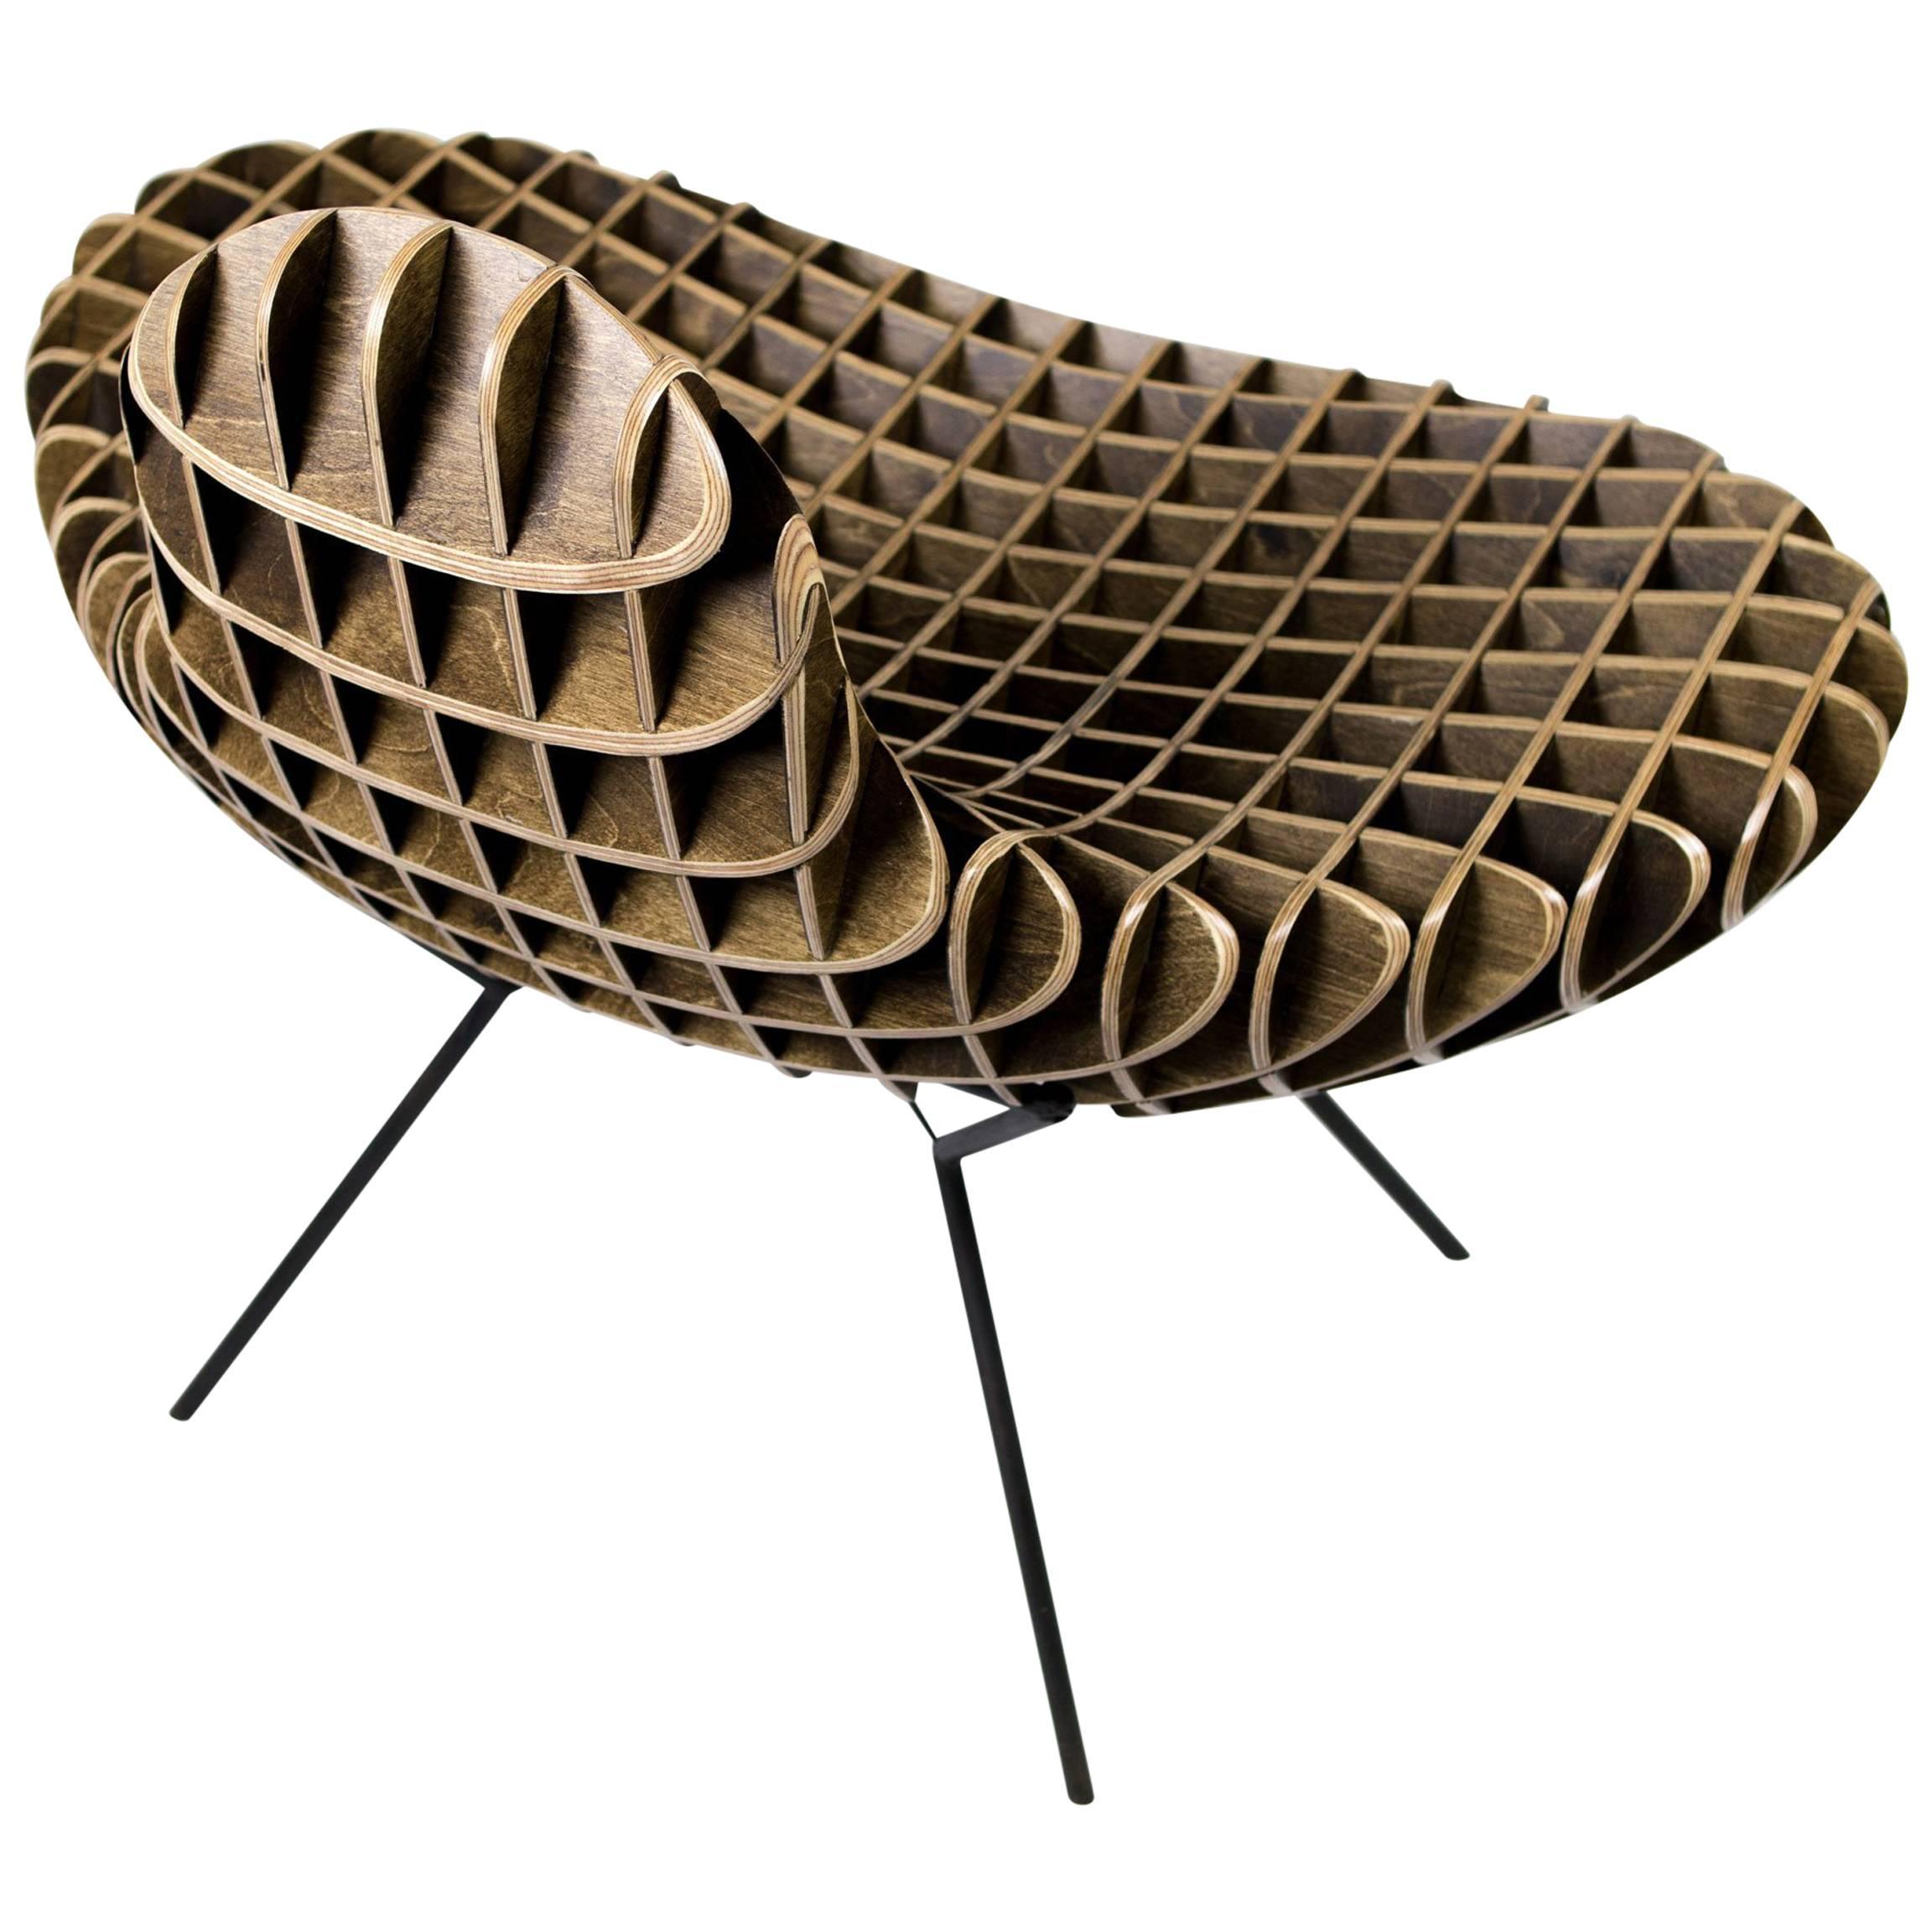 'The Quarry Collection' Bantam Chair, by Studio Artist, Ryan Dart, USA, 2017